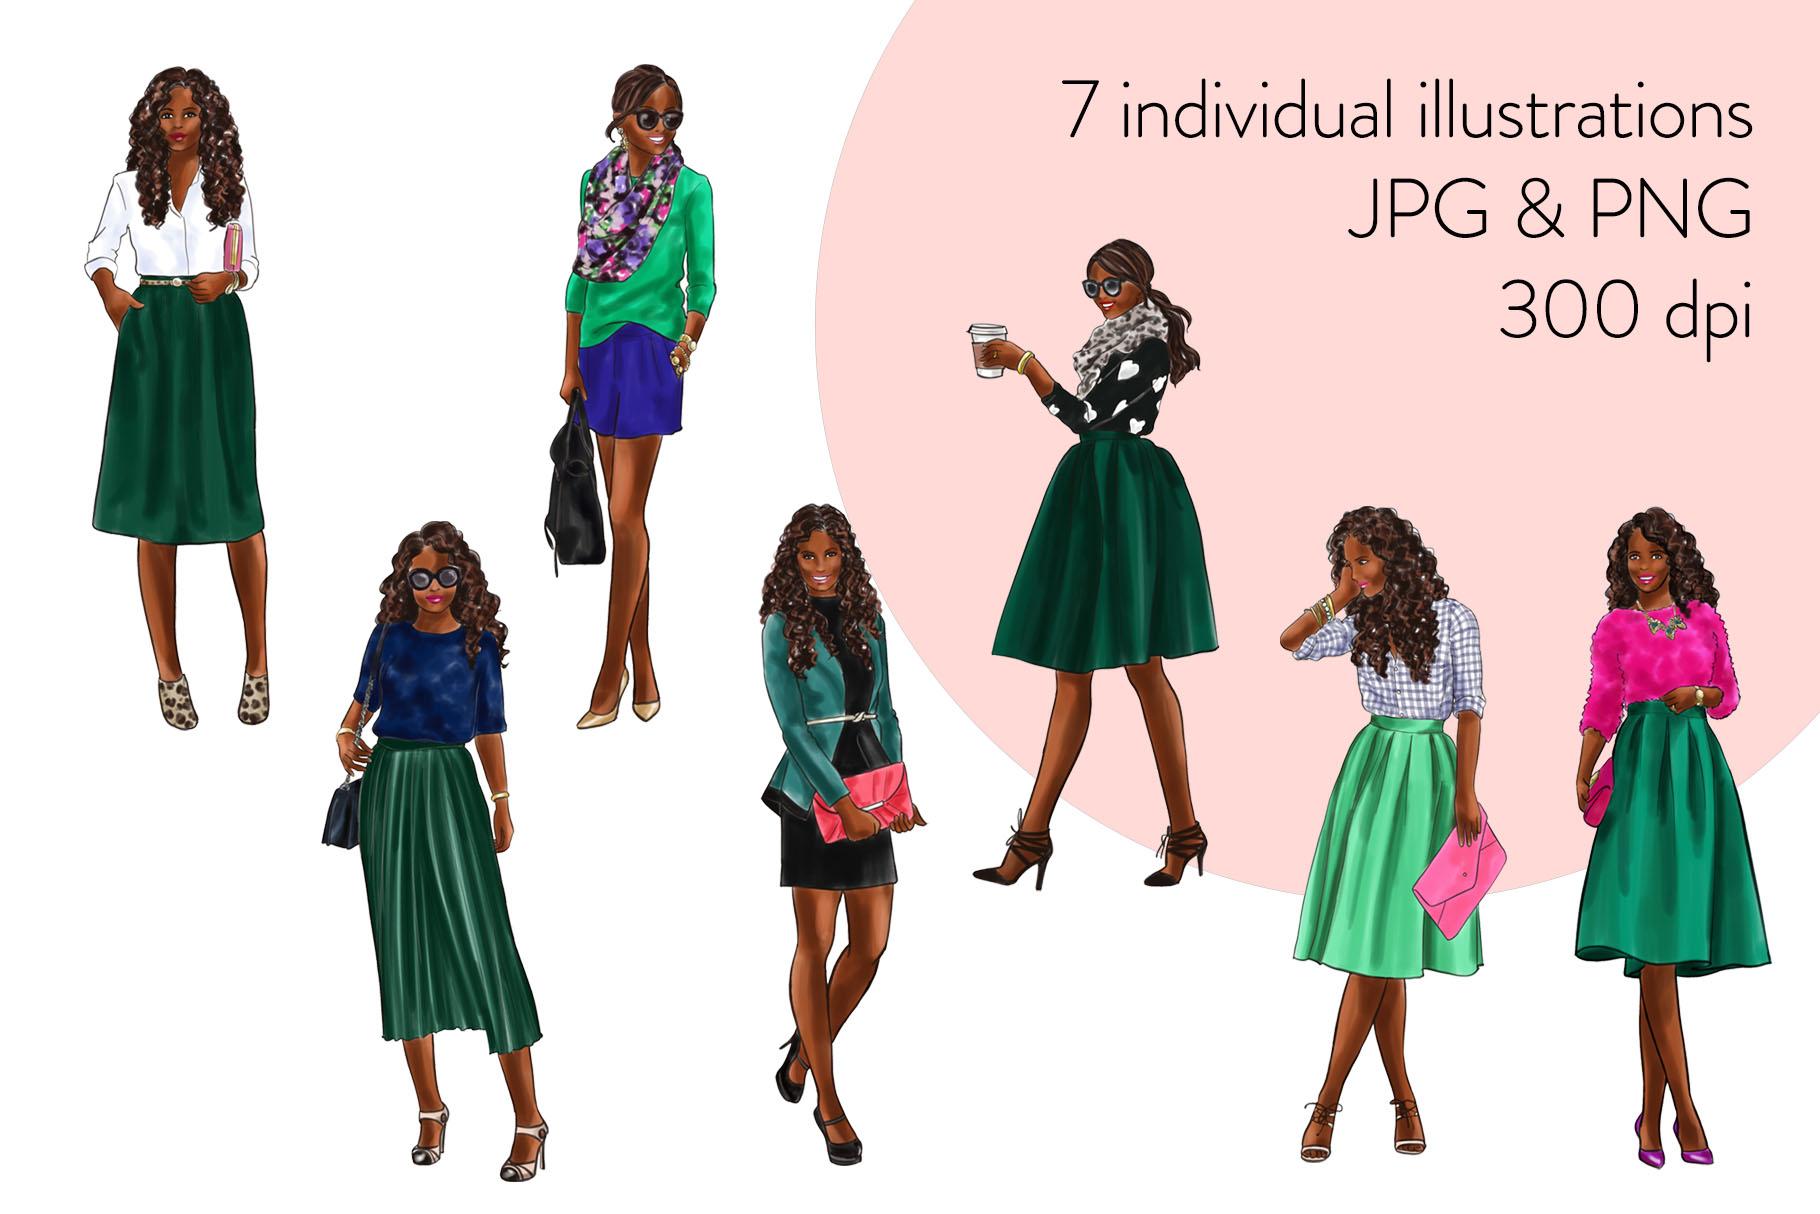 Fashion illustration clipart - Girls in Green 2 - Dark Skin example image 2